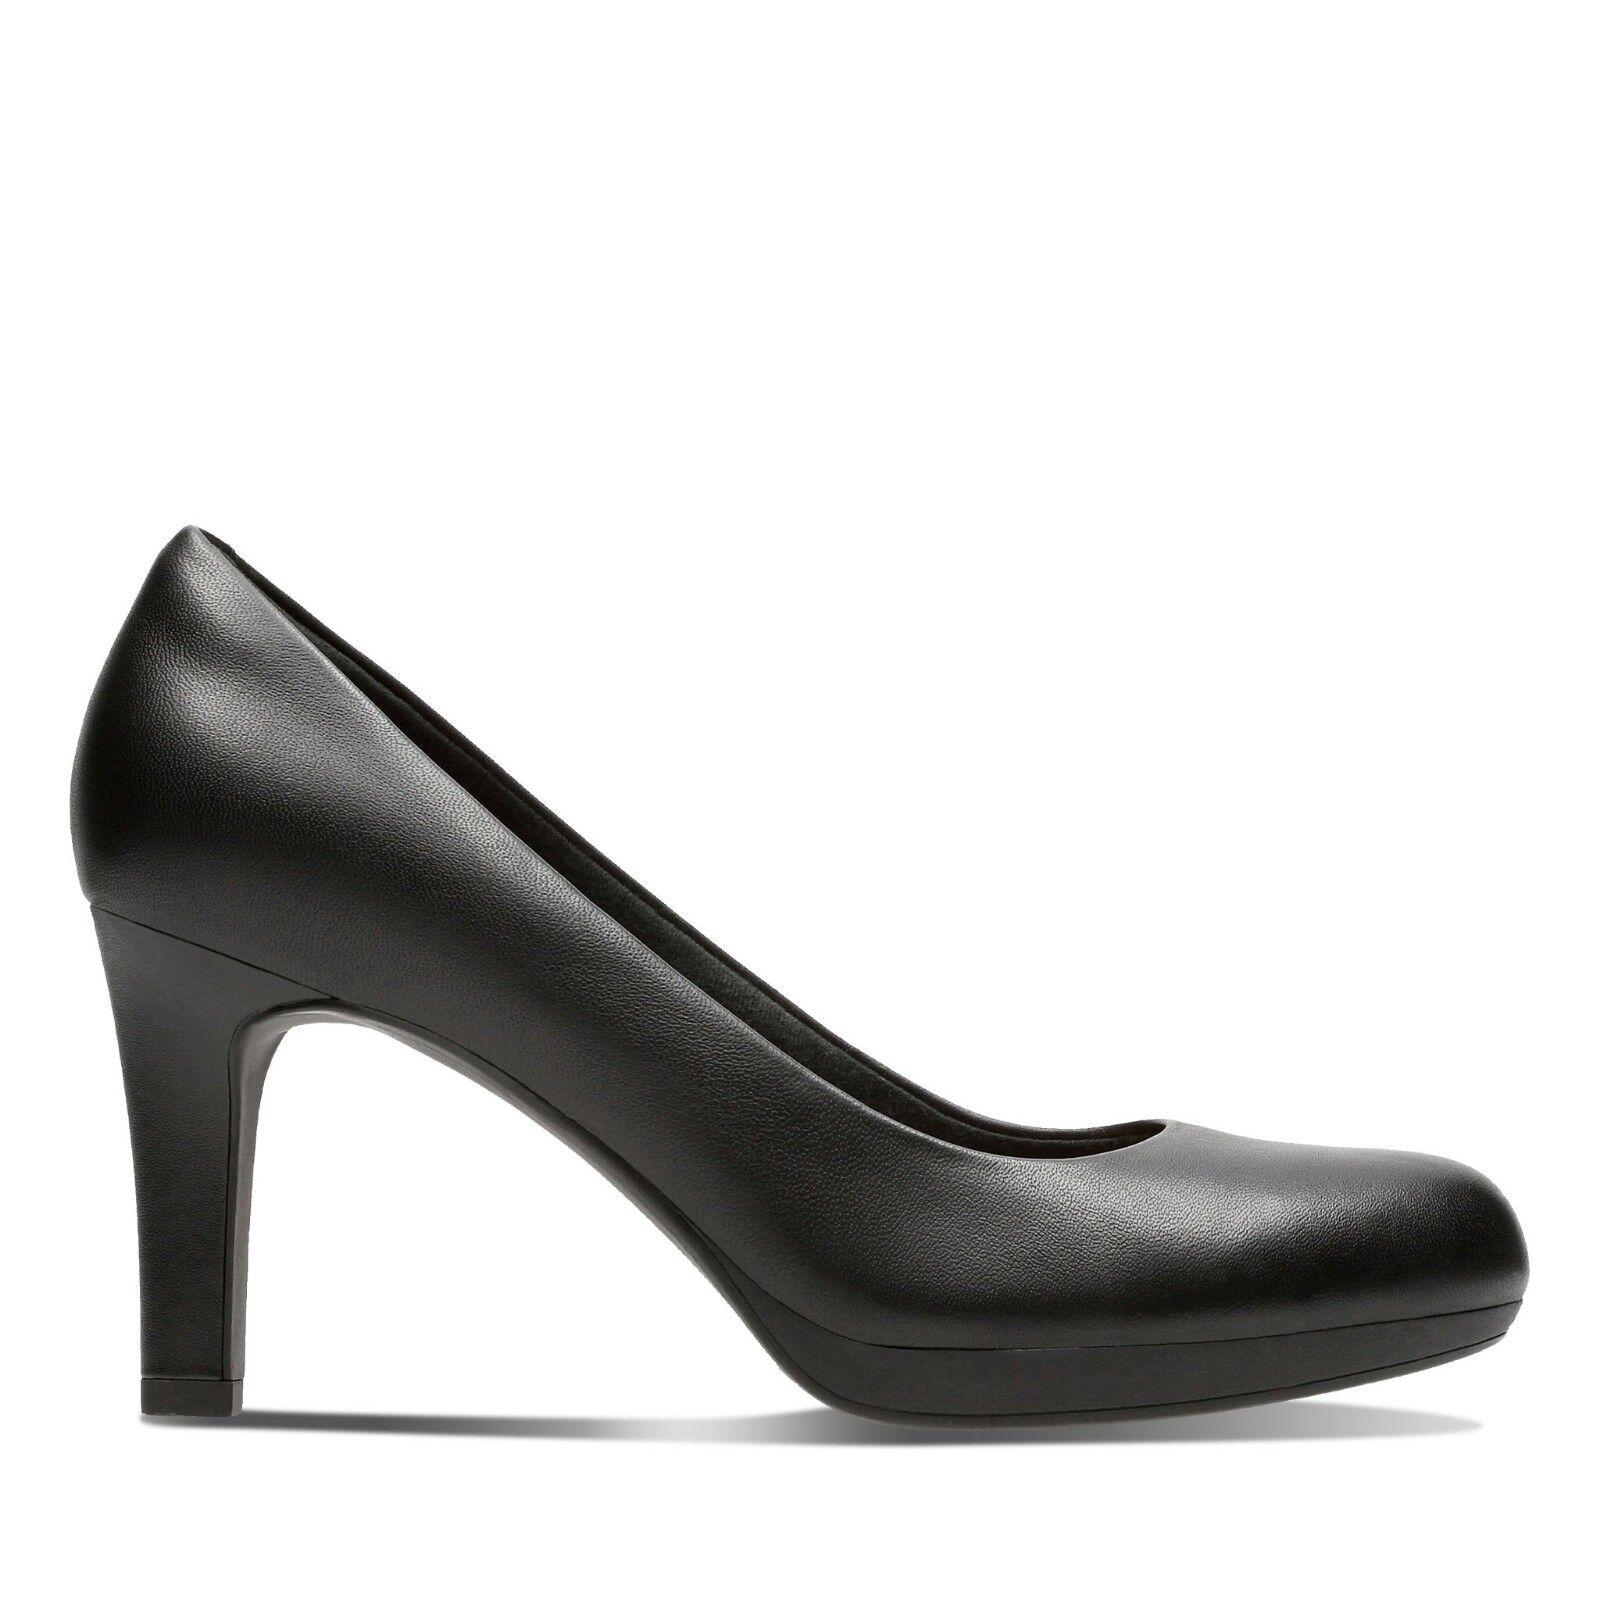 Clarks Damen Damen Clarks Schuhe Adriel Lila Schwarzes Leder D Weite Passform e6ef06